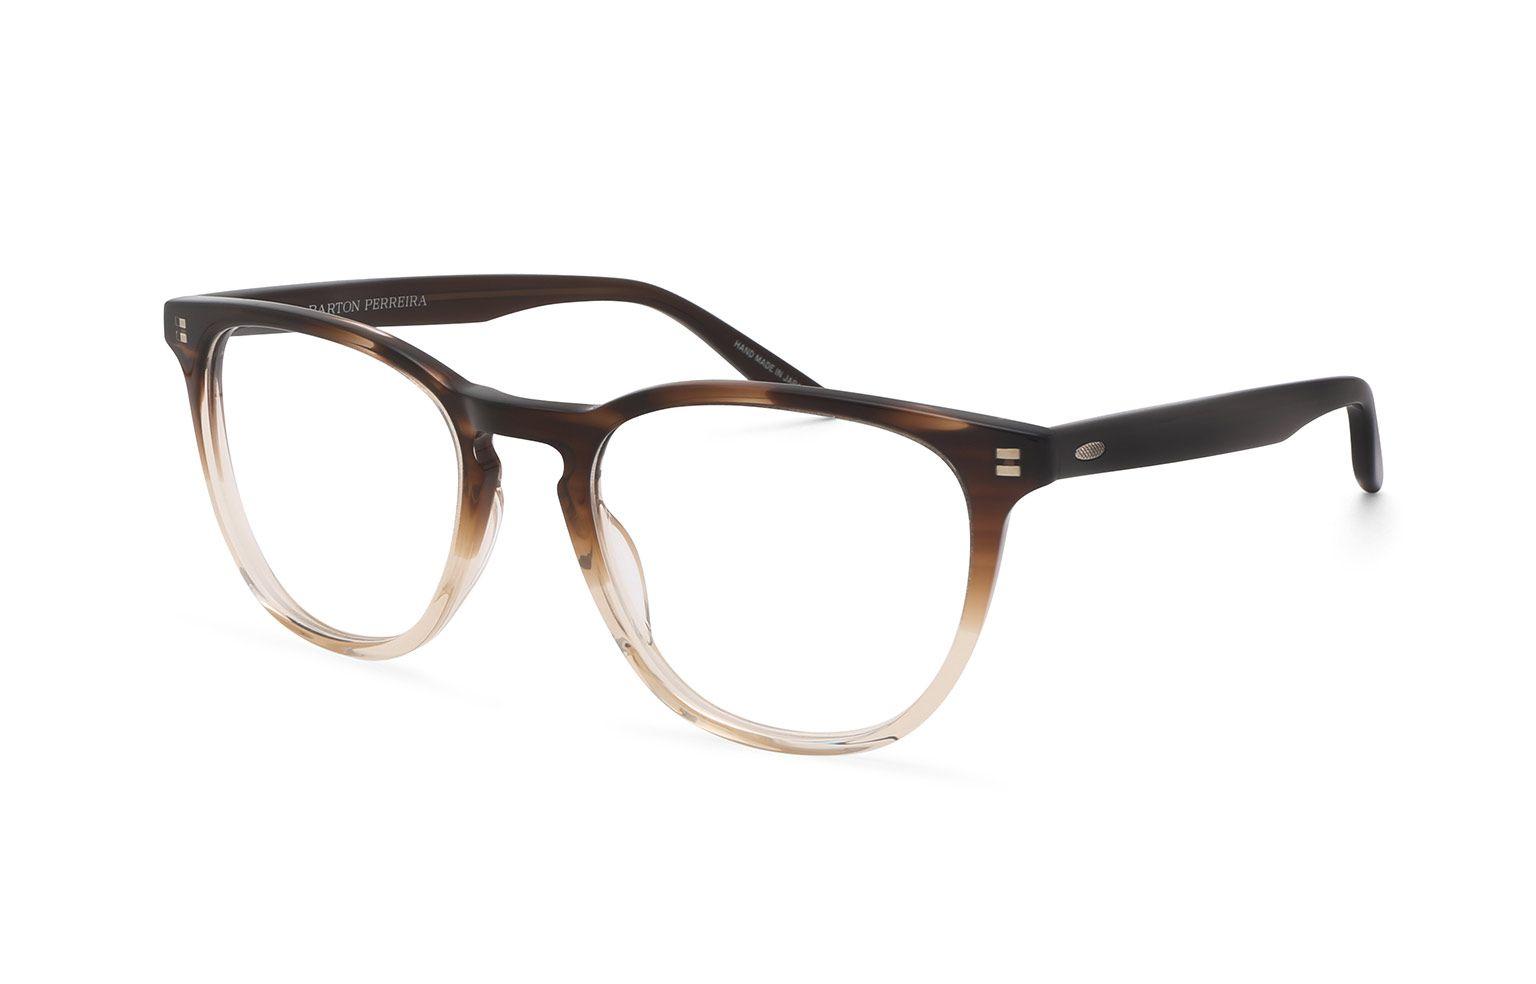 b44014e6d4 Barton Perreira REDDING frames at Risi Optique